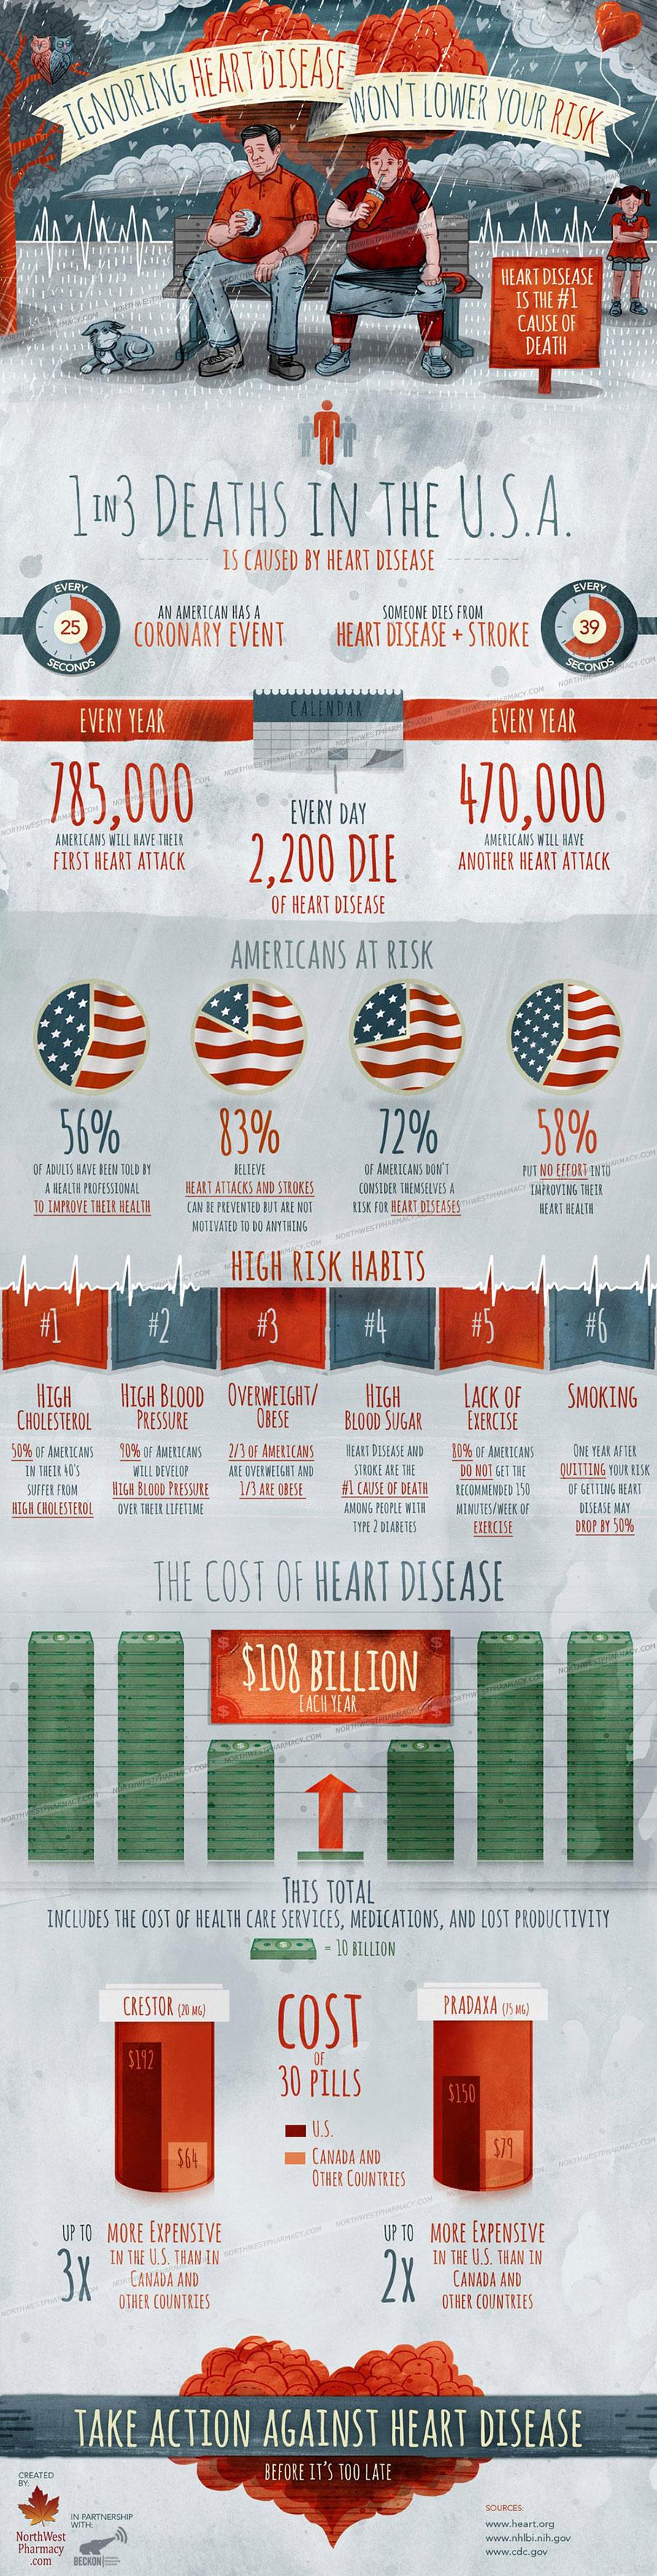 Ignoring Heart Disease Won't Lower Your Risk